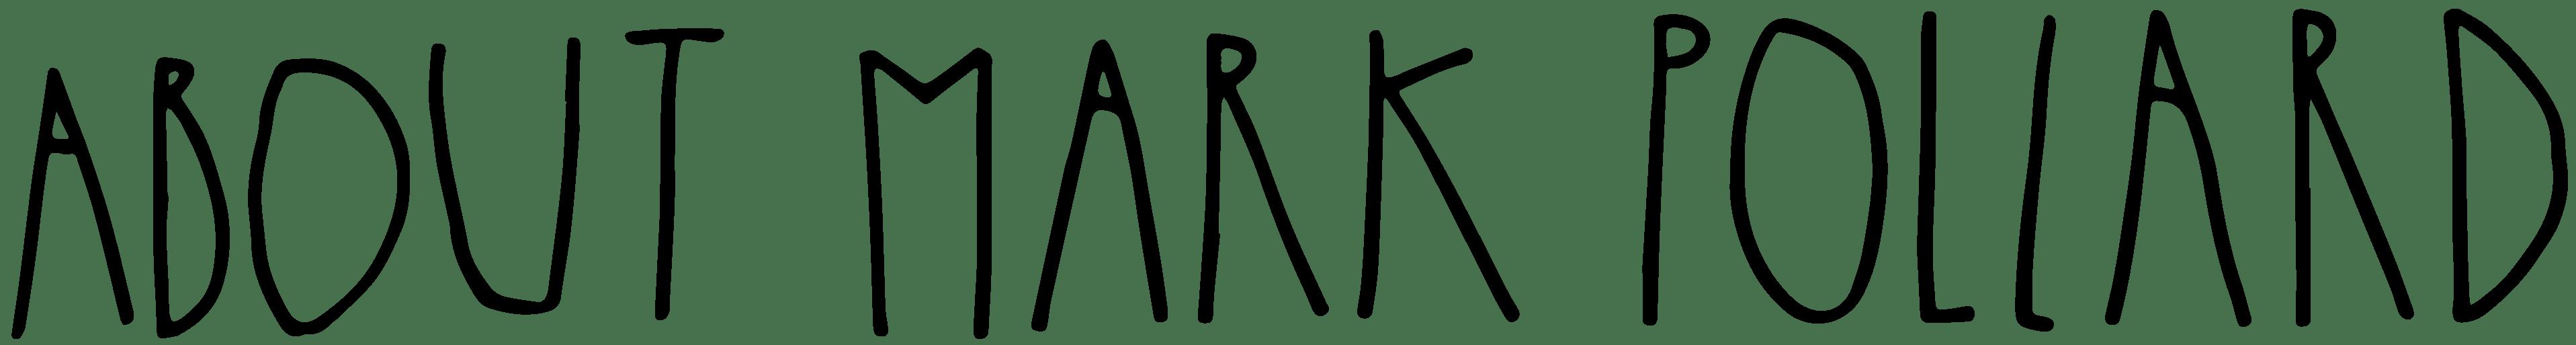 About Mark Pollard